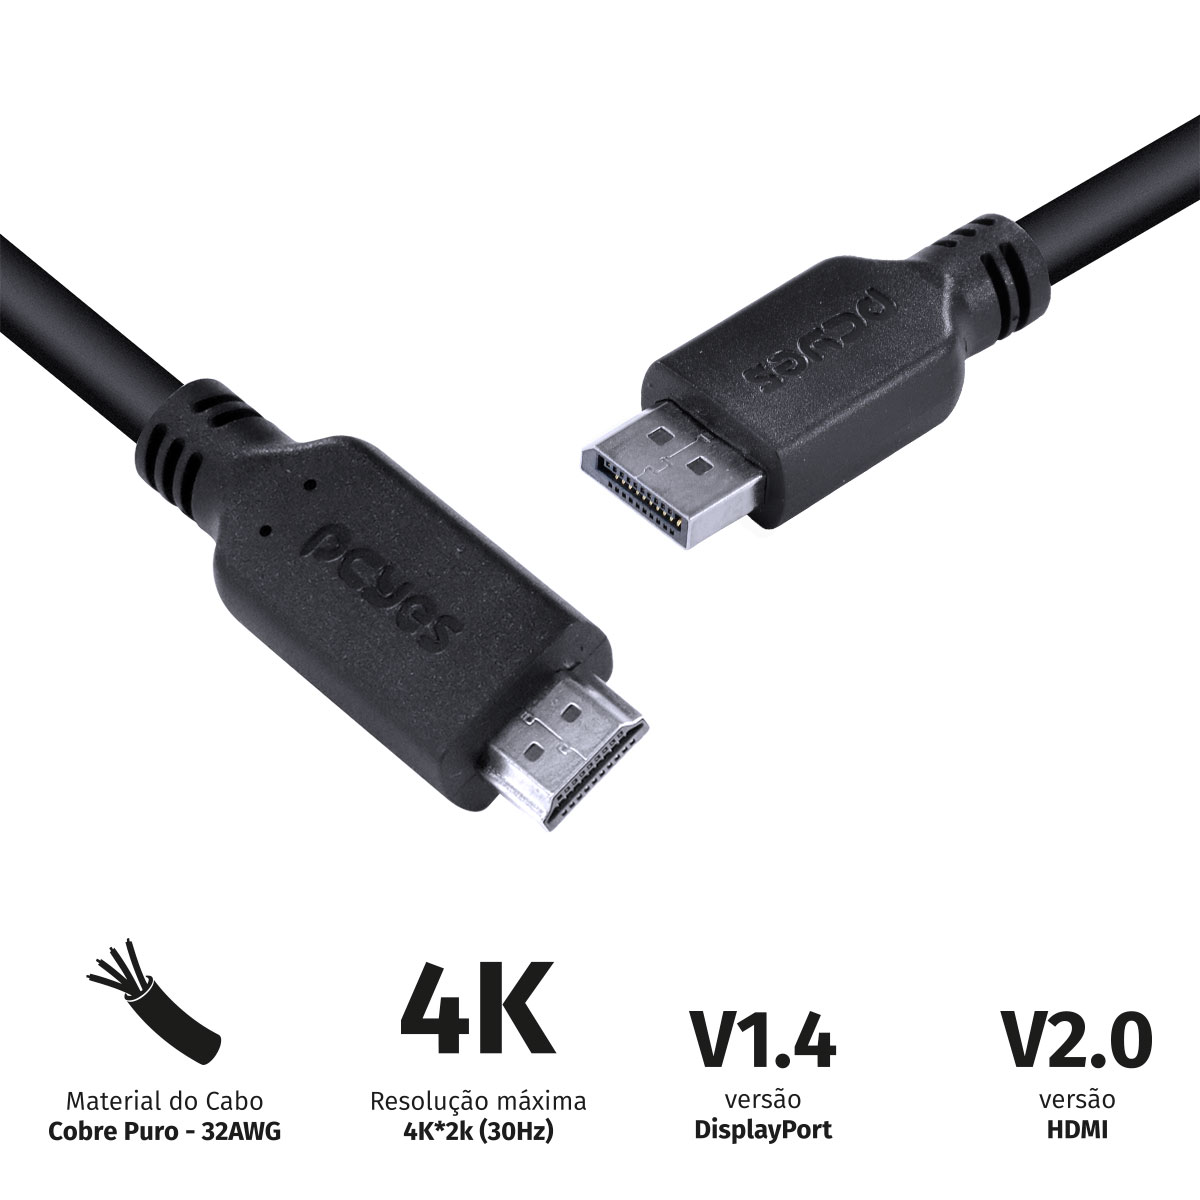 CABO DISPLAYPORT MACHO PARA HDMI 2.0 MACHO 2 METROS - PDPHM-2